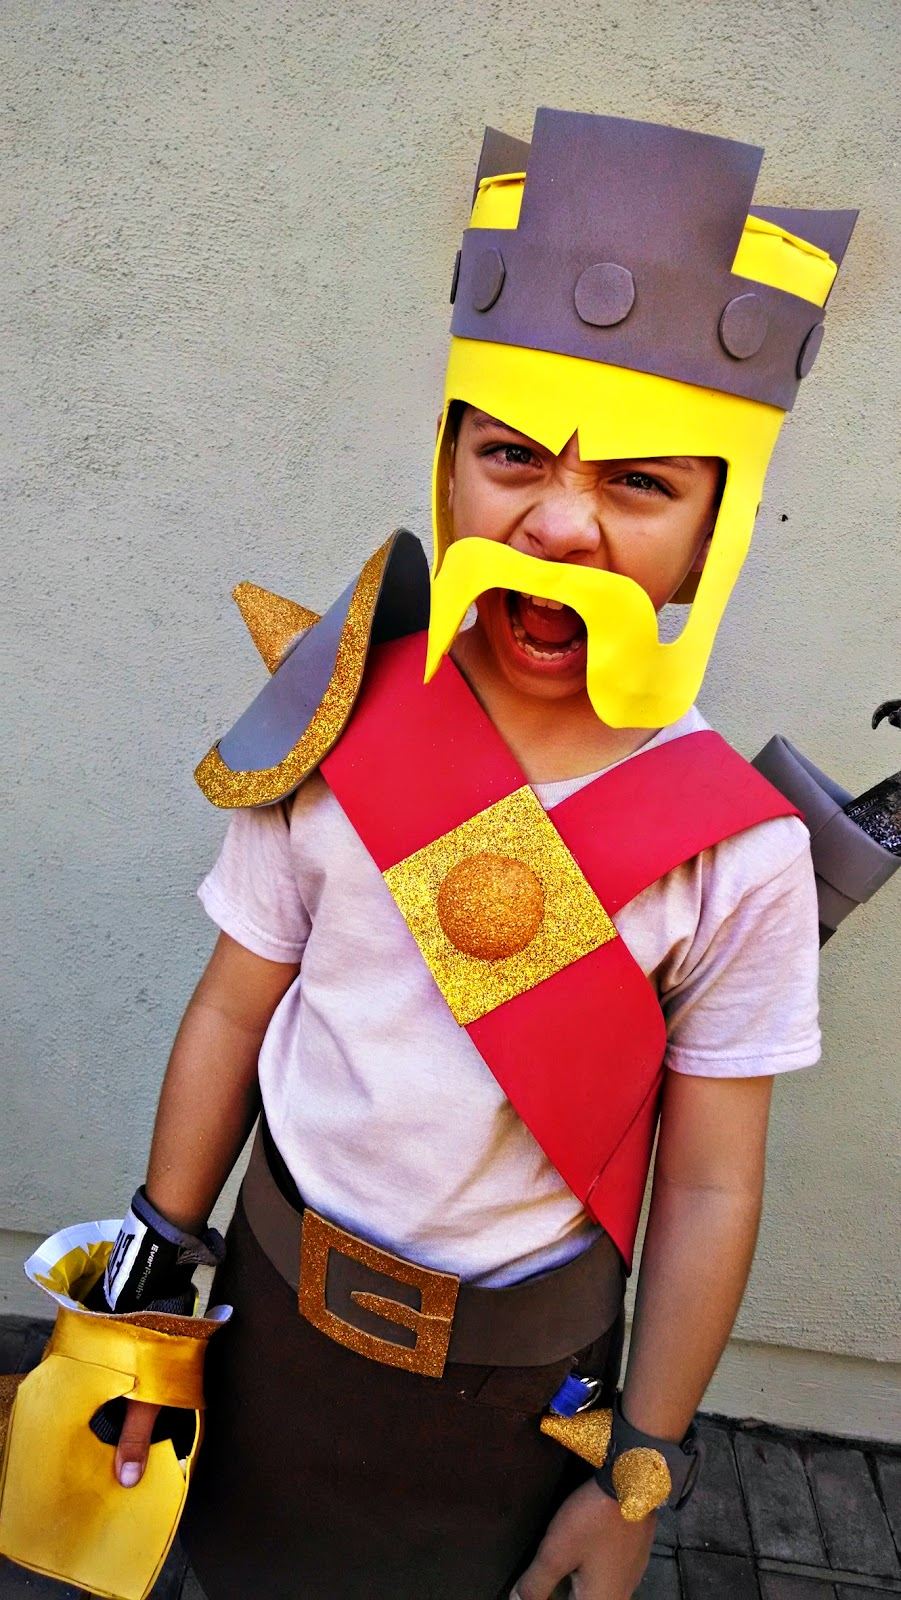 BonggaMom: Halloween Costume Watch 2014: Clash of Clans Barbarian King